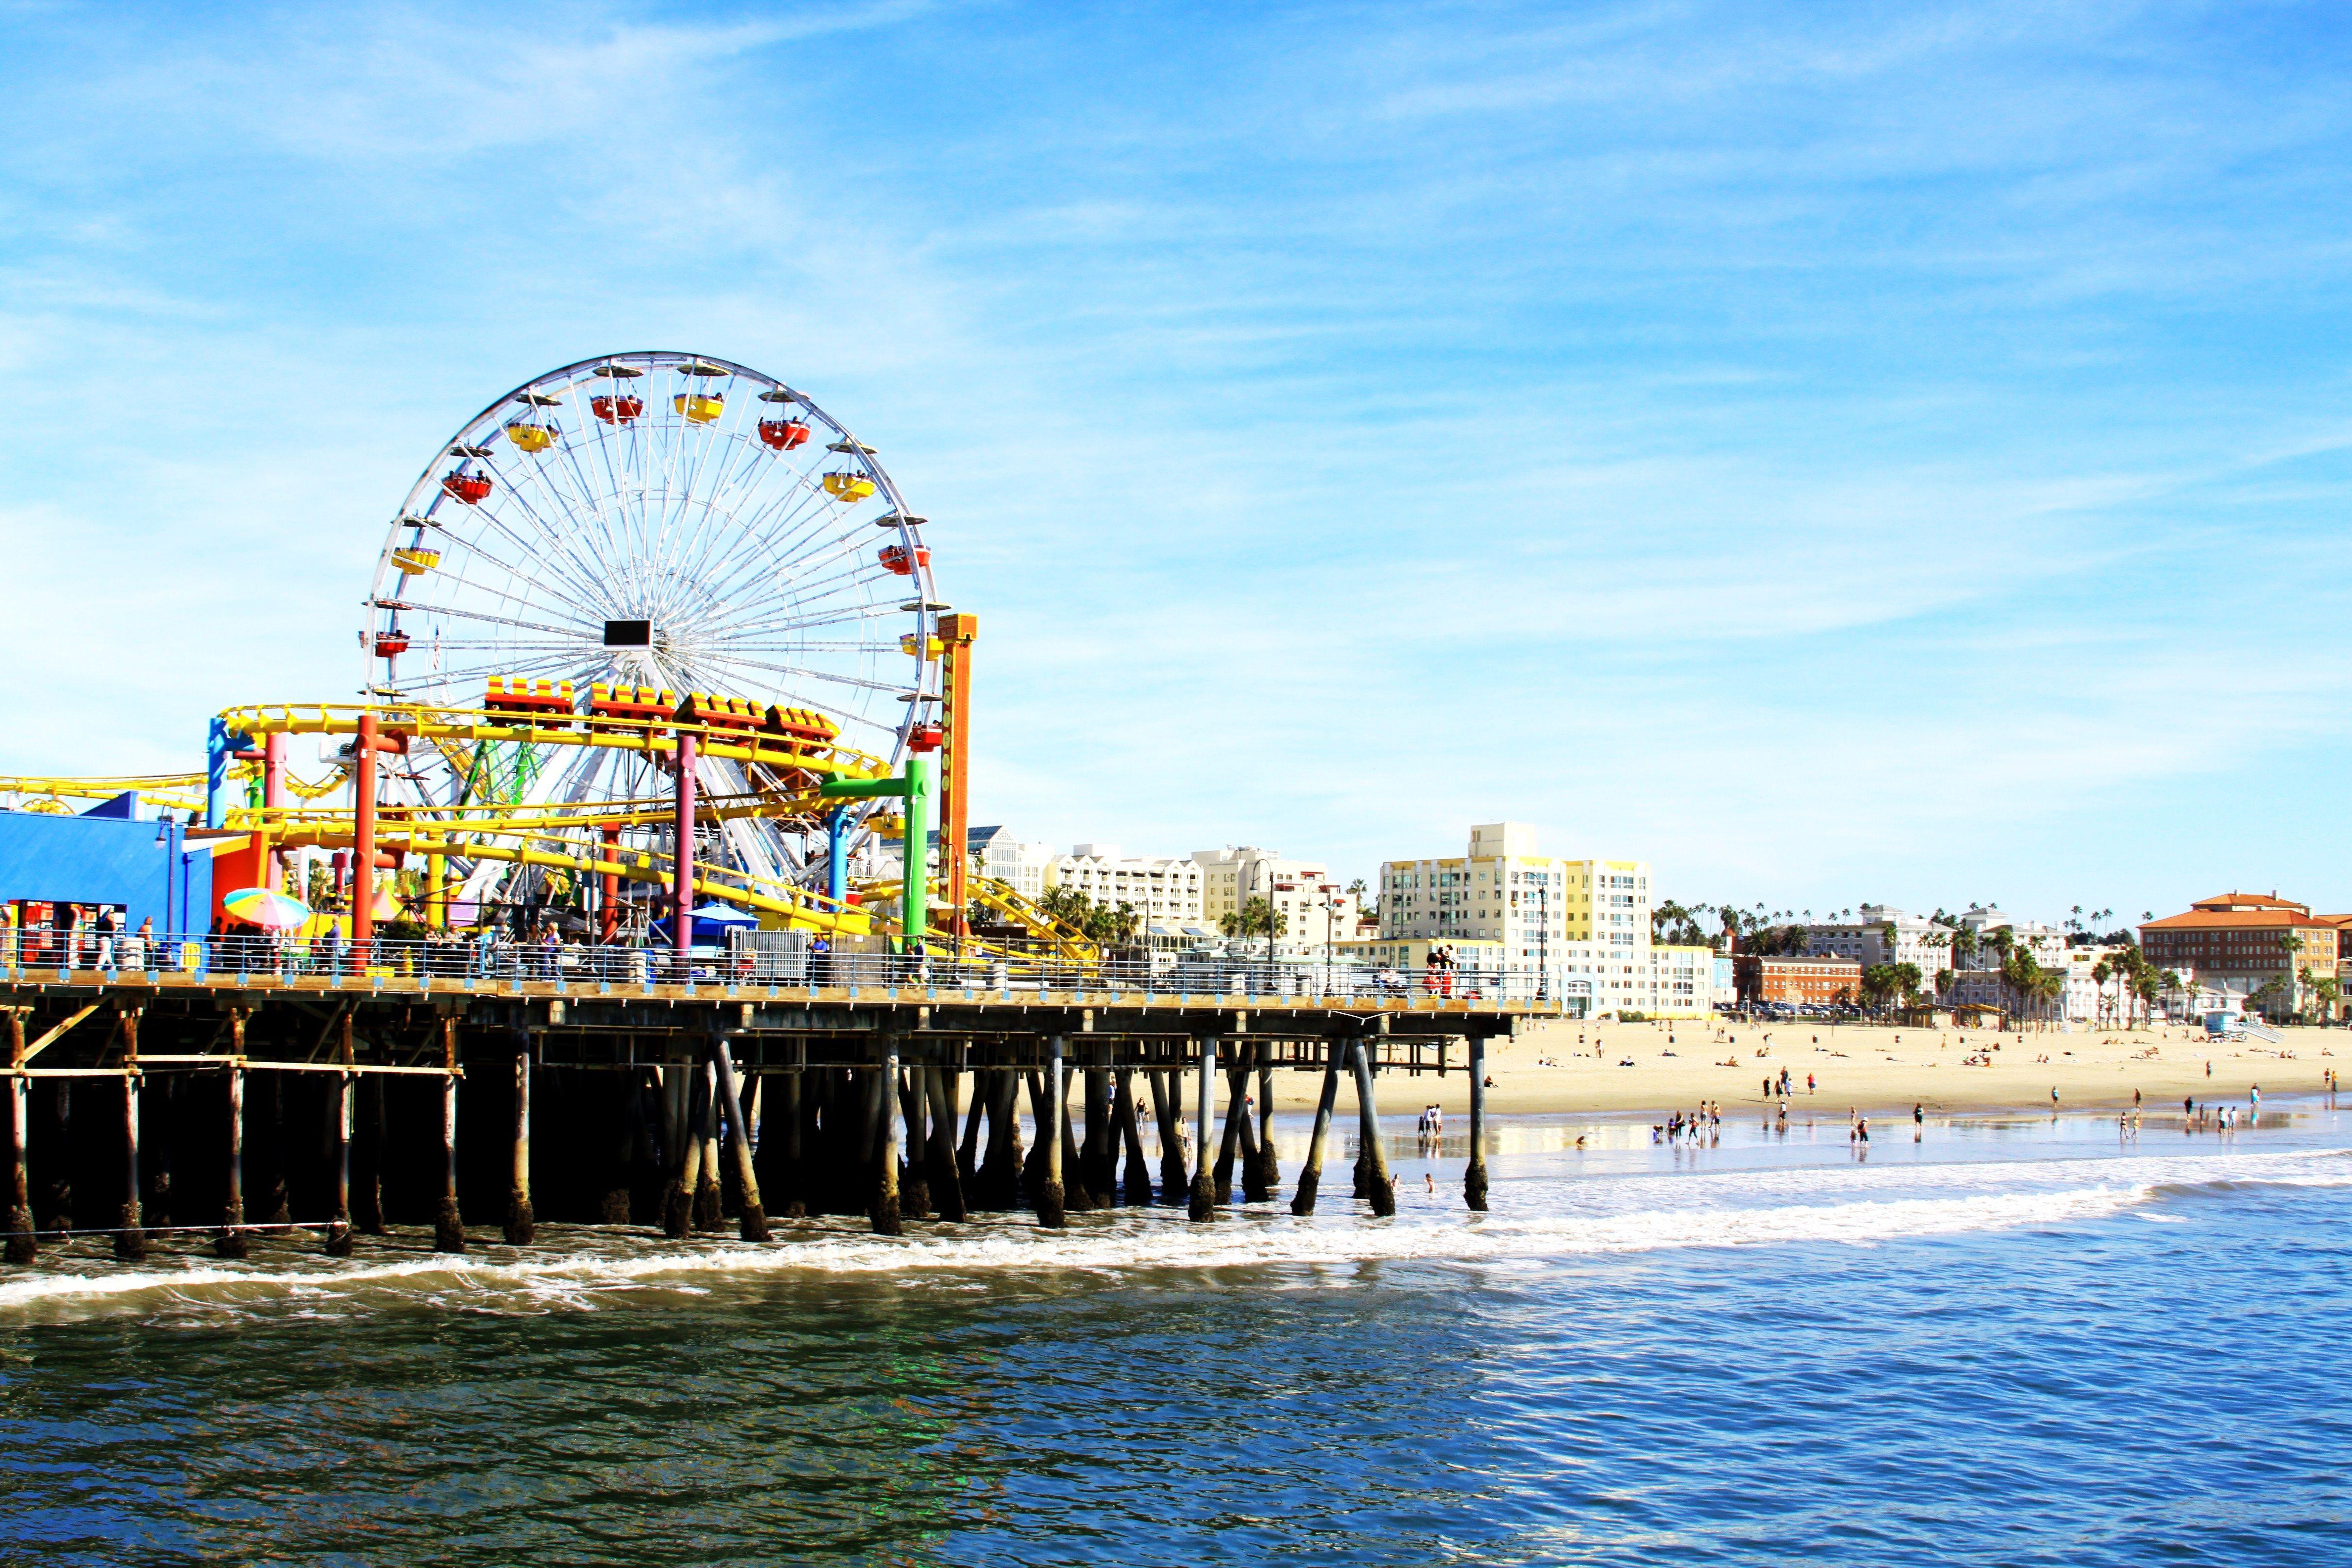 Santa Monica Pier Santa Monica Los Angeles Attractions Santa Monica State Beach Santa Monica Pier